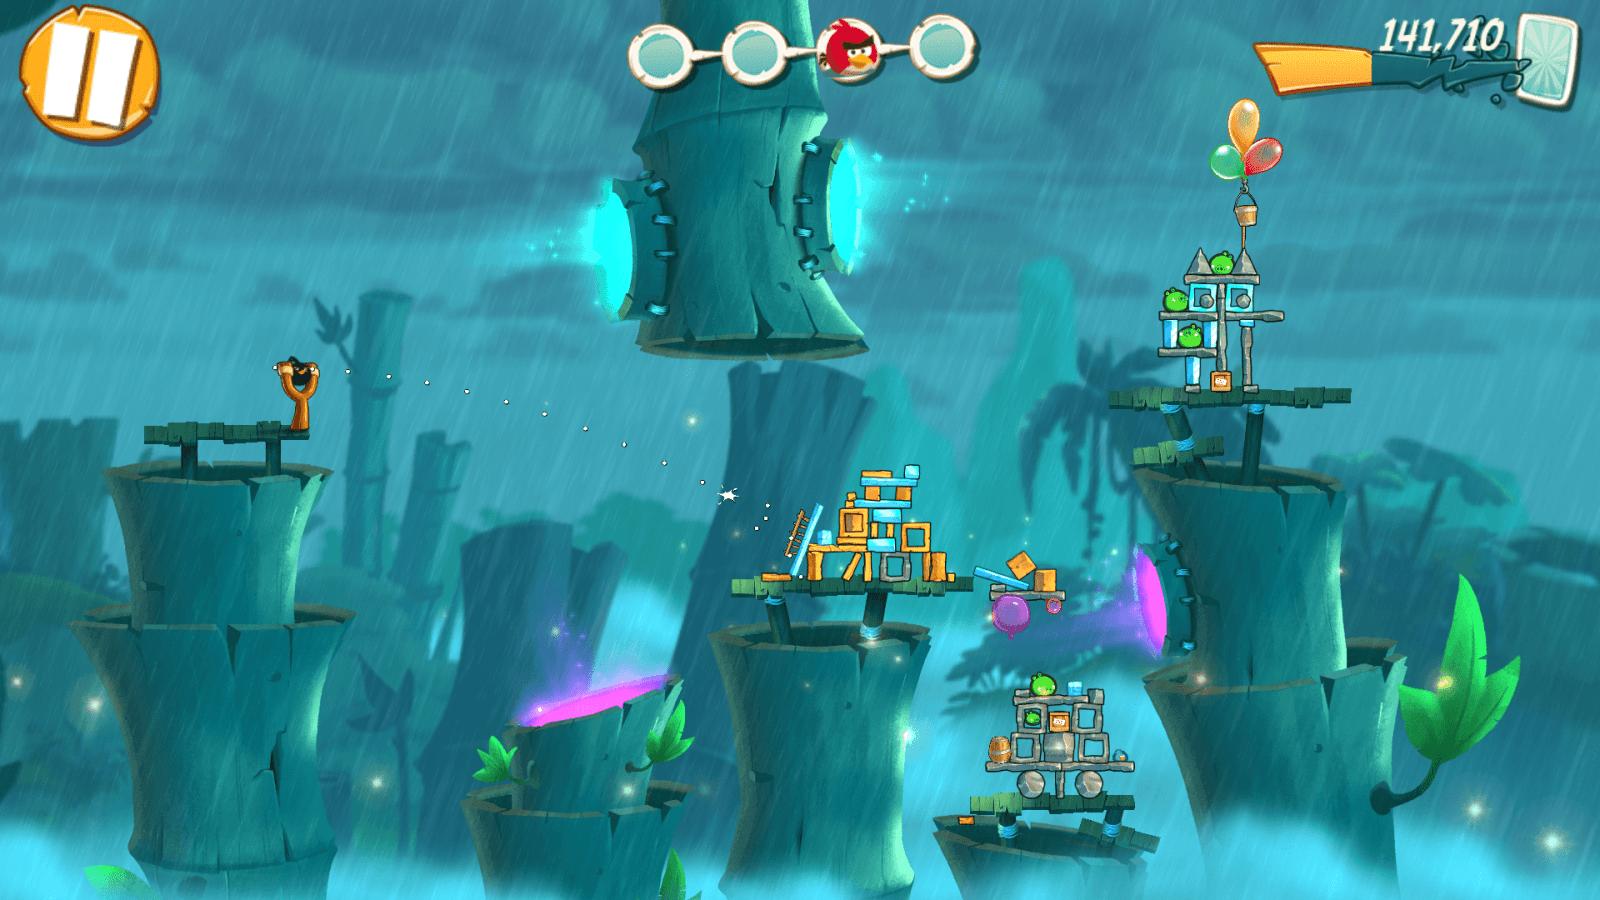 Screenshot 2015 08 19 23 39 10 - Обзор Angry Birds 2